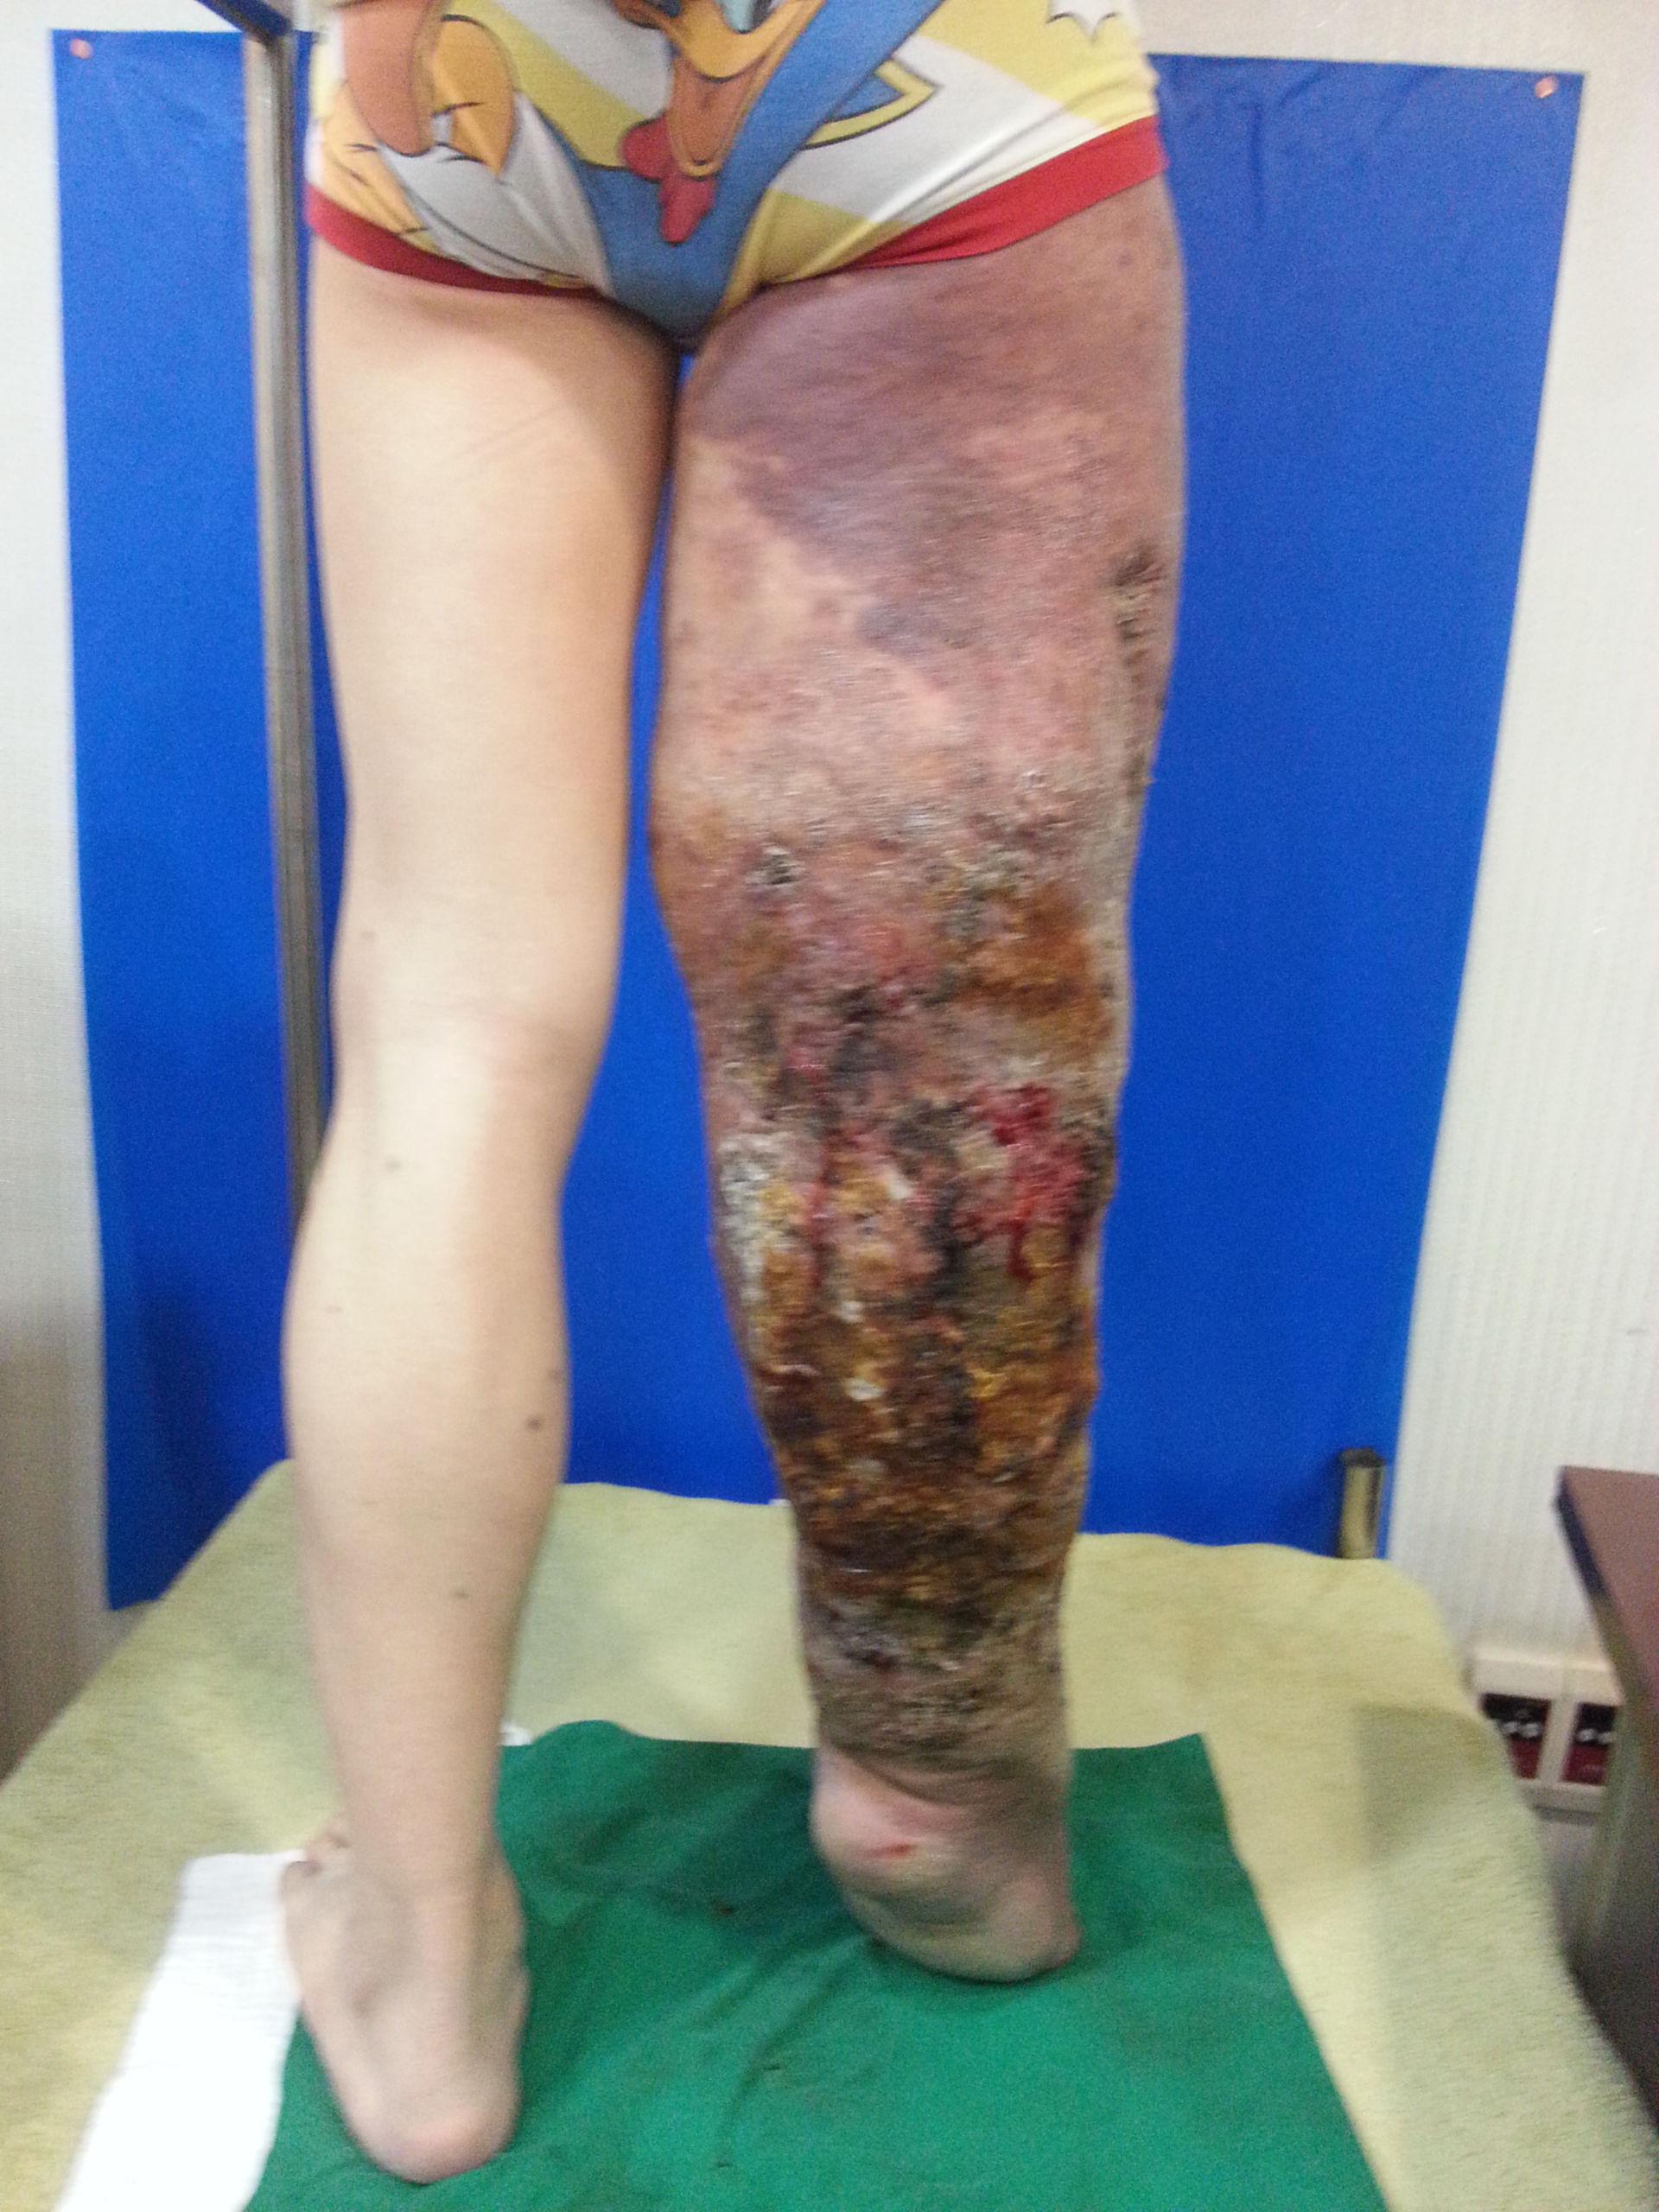 Patient mit Hyperkeratose